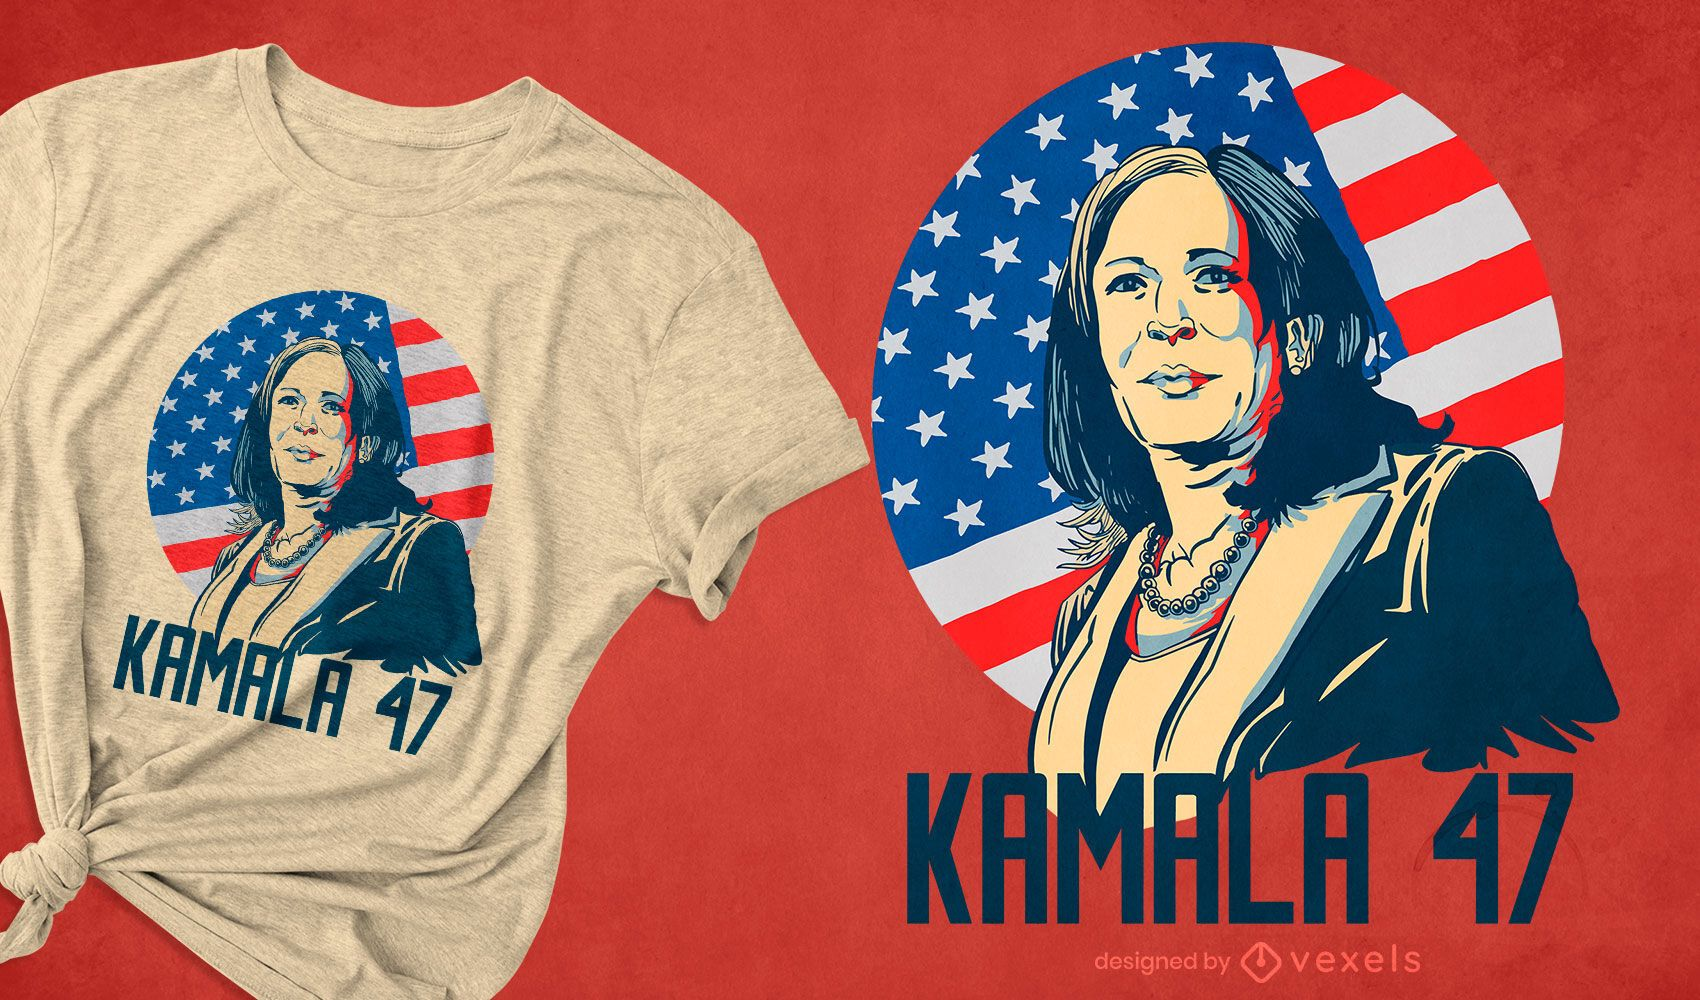 Diseño de camiseta Kamala 47